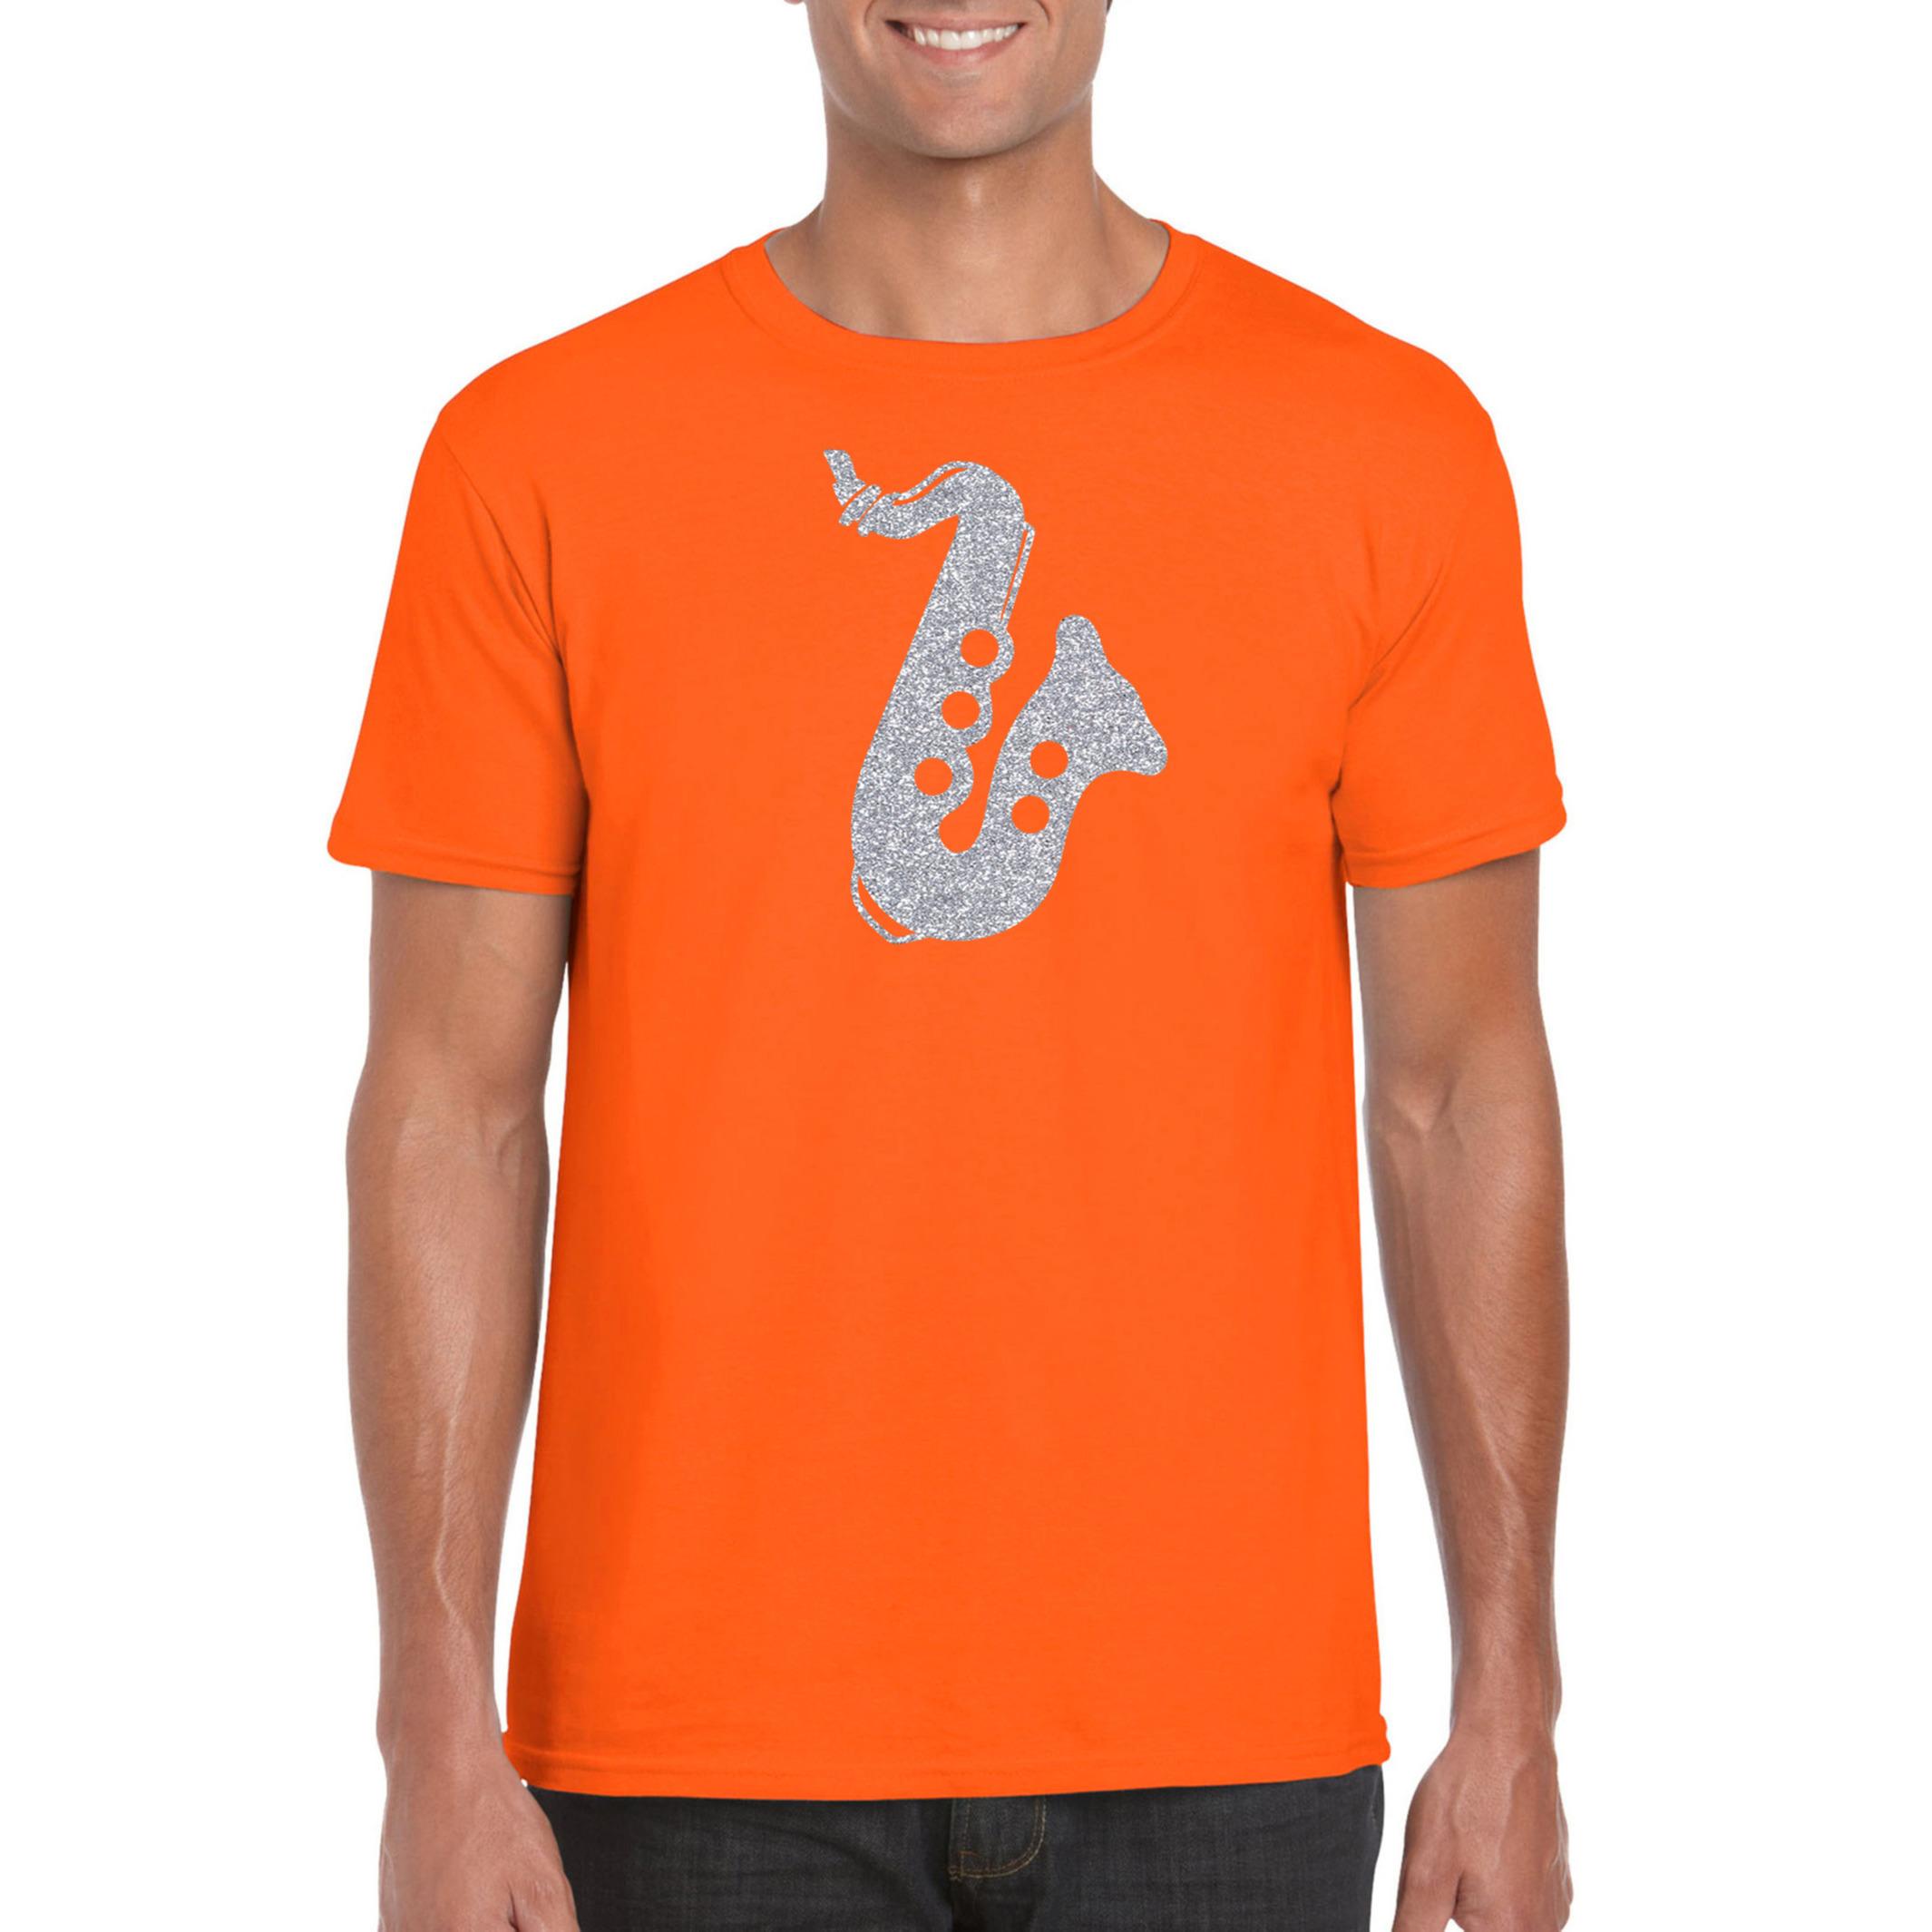 Zilveren saxofoon - muziek t-shirt - kleding oranje heren